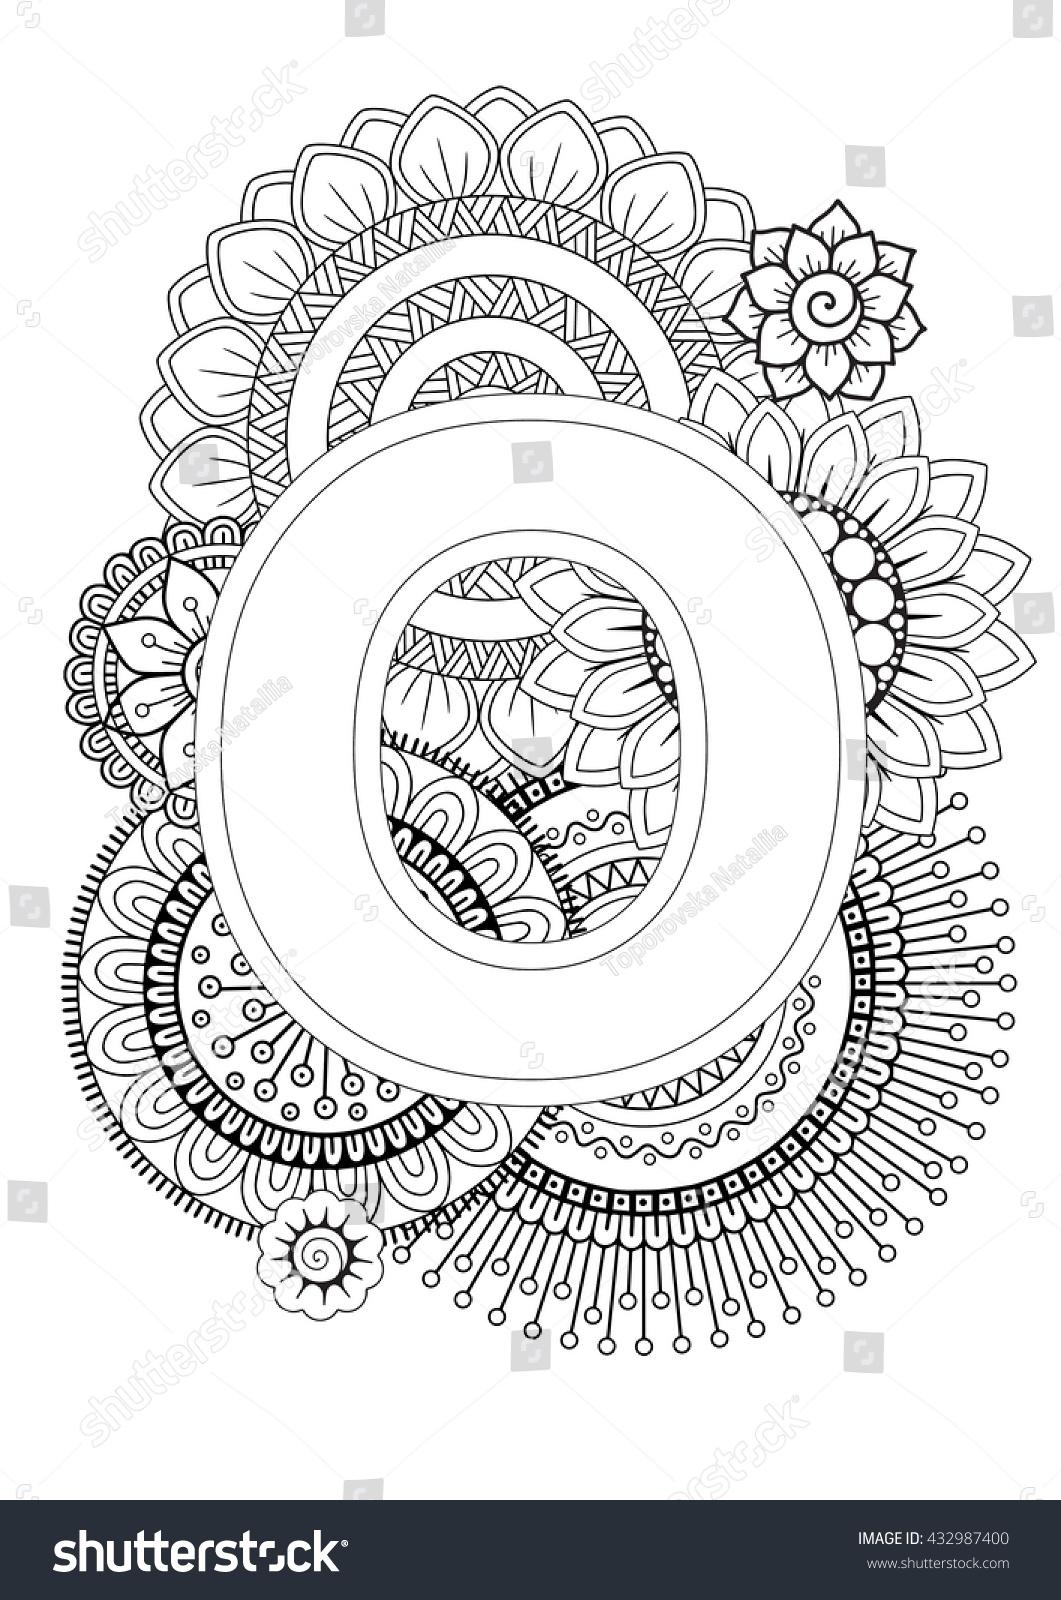 doodle floral letters coloring book adult stock vector 432987400 shutterstock. Black Bedroom Furniture Sets. Home Design Ideas